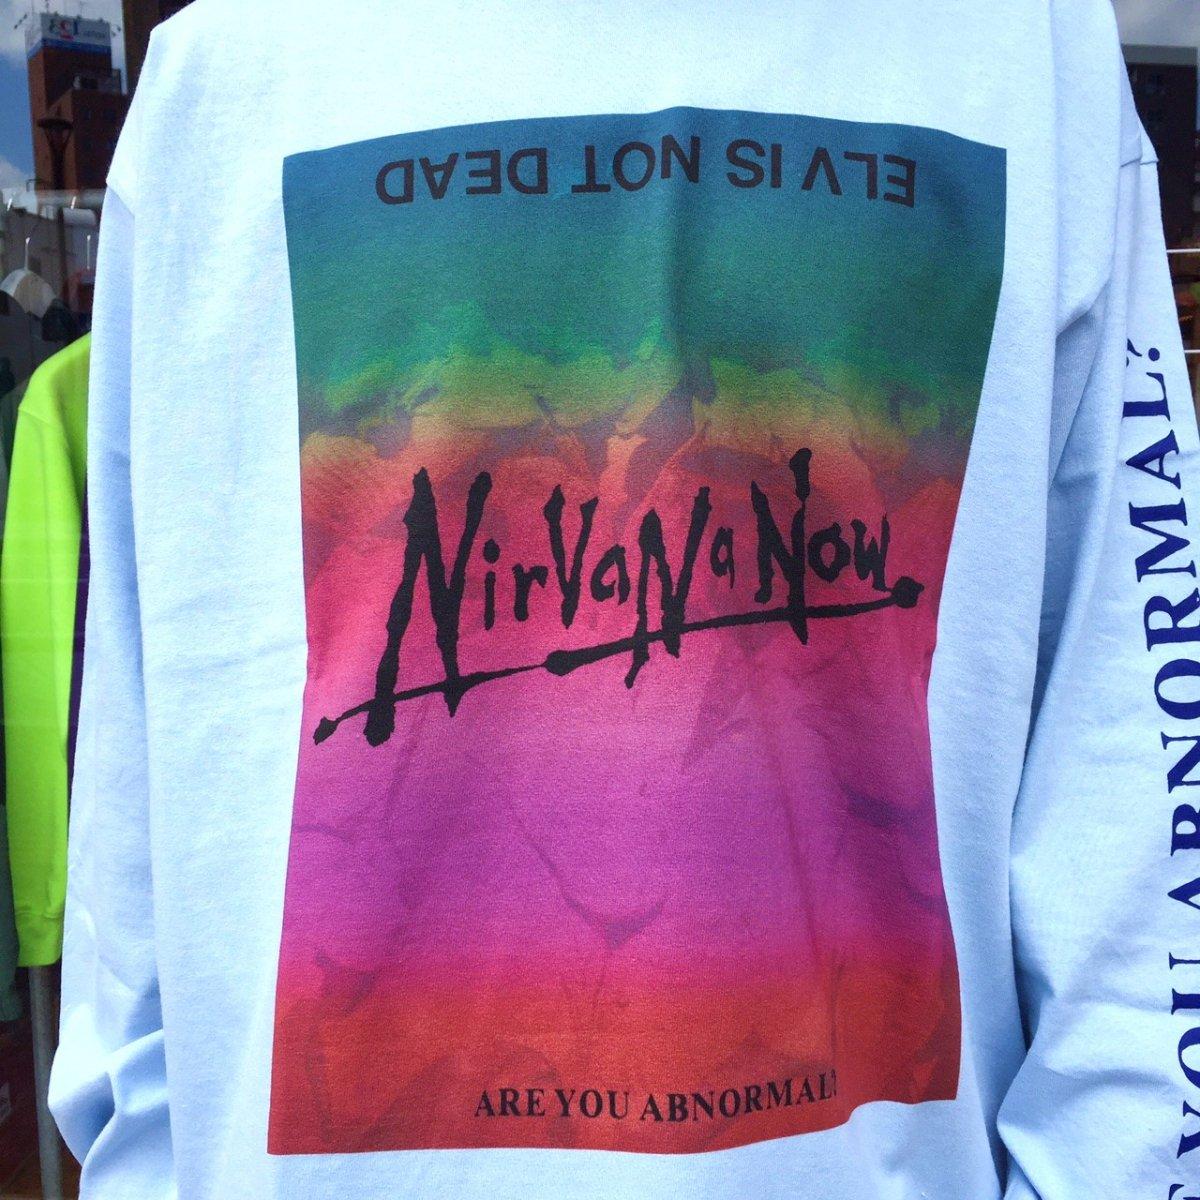 <img class='new_mark_img1' src='https://img.shop-pro.jp/img/new/icons3.gif' style='border:none;display:inline;margin:0px;padding:0px;width:auto;' />Black Weirdos  ブラック ウィドー / ロングTシャツ Nirvana ELVS L/S Tee 【WHITE】